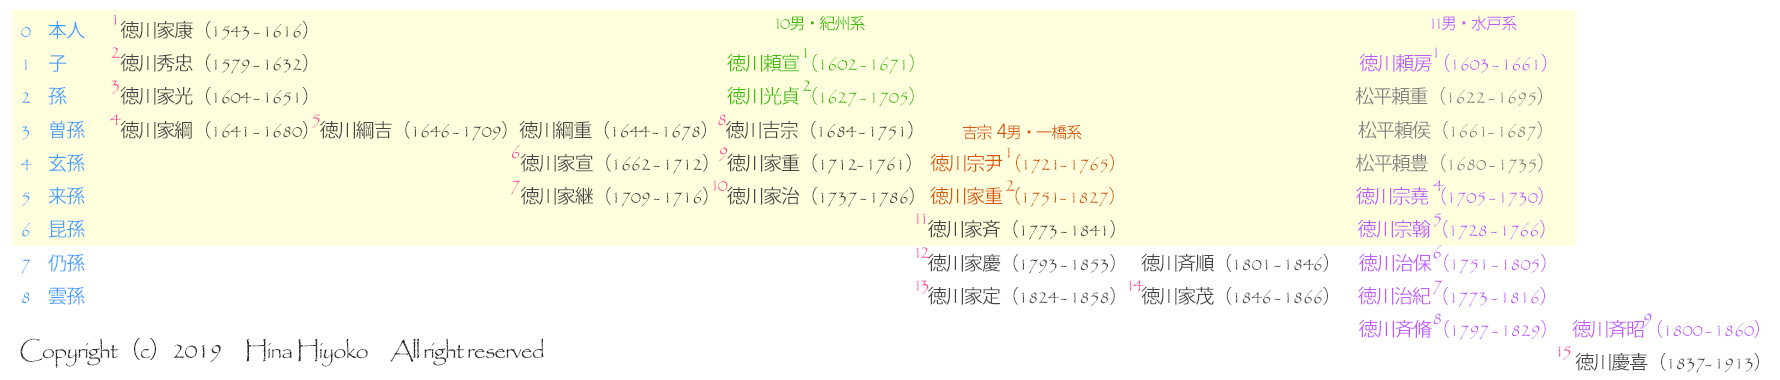 190515tokugawa_ketsuen1.jpg